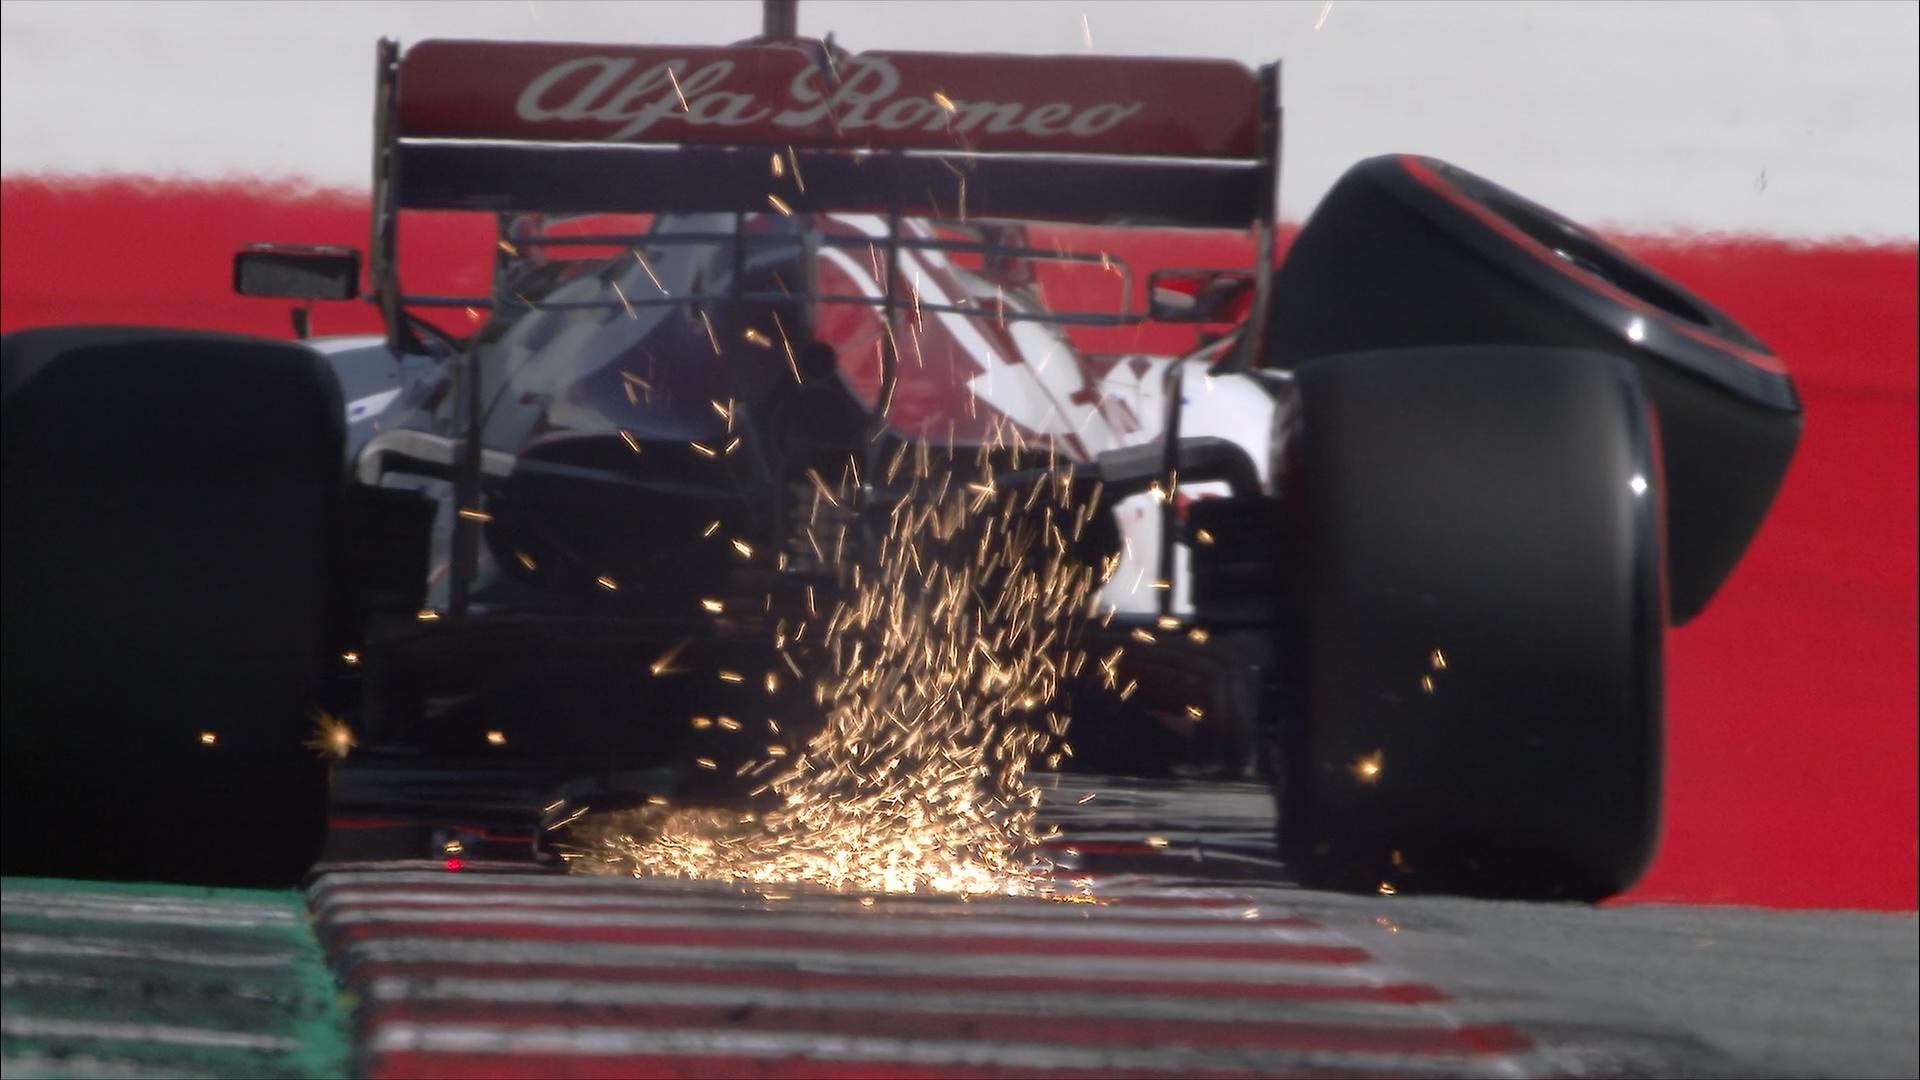 Austrian Grand Prix 2020: Raikkonen's wheel flies off